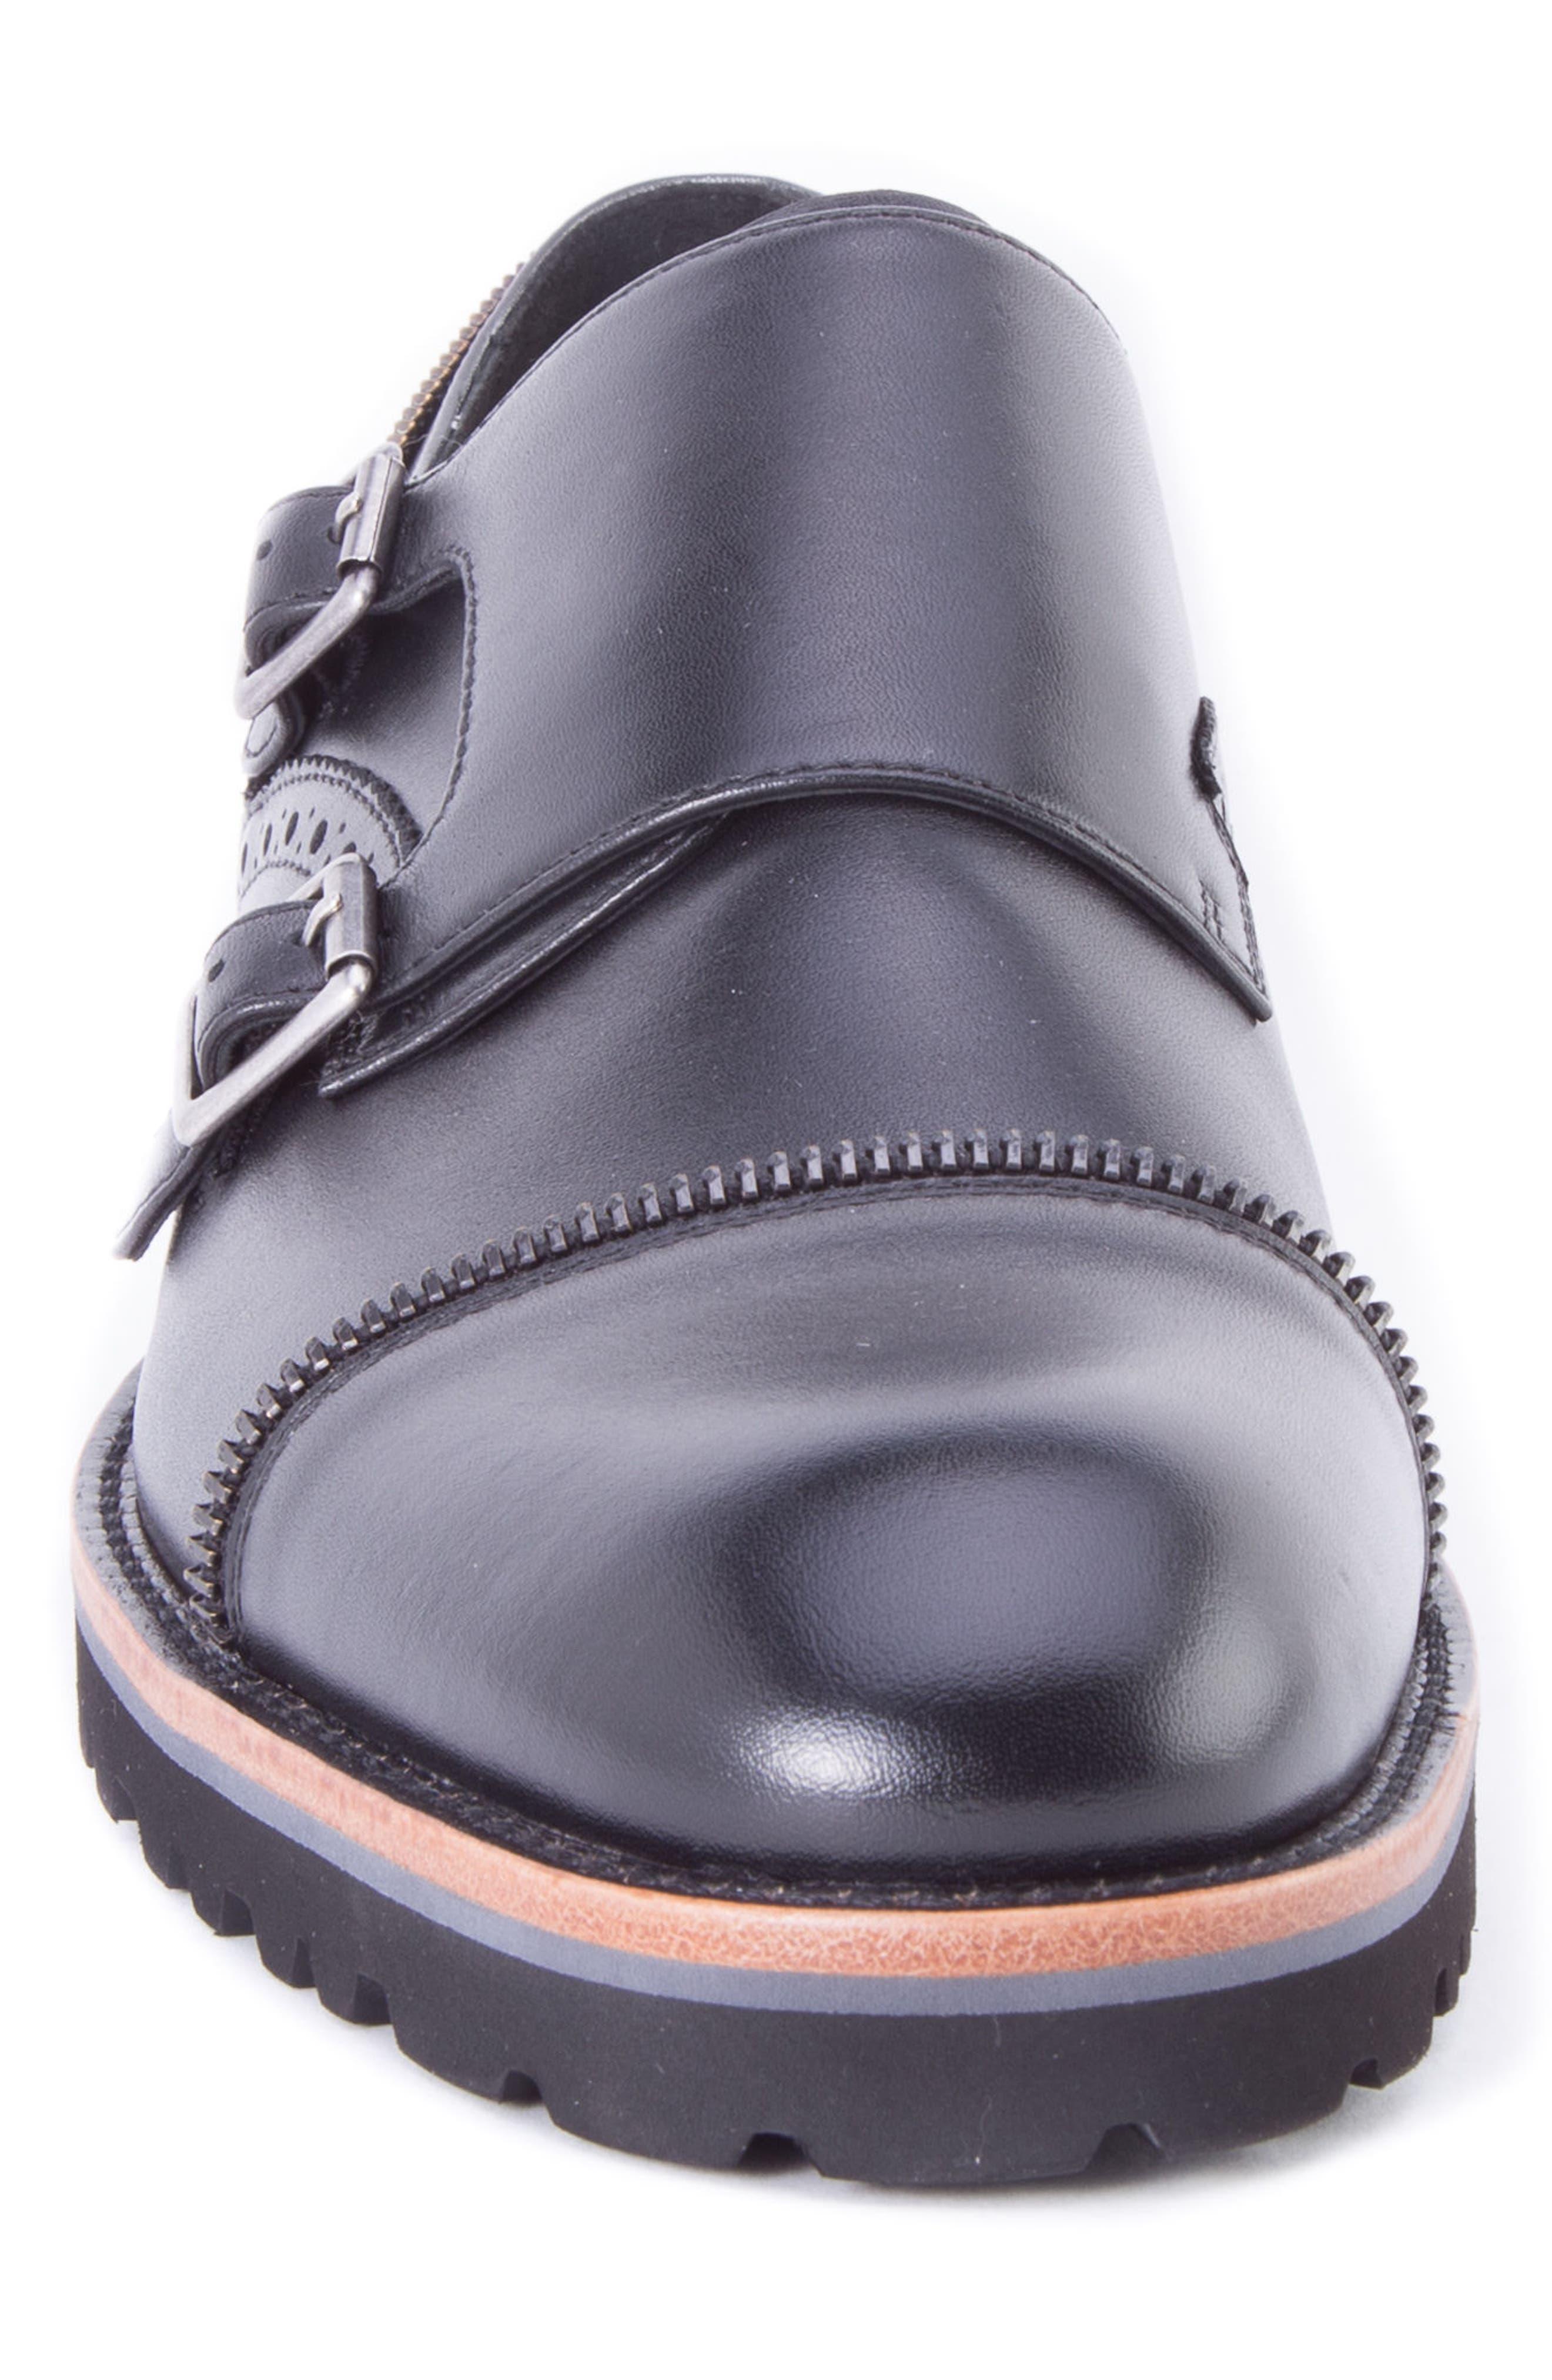 Acadia Double Buckle Monk Shoe,                             Alternate thumbnail 4, color,                             BLACK LEATHER